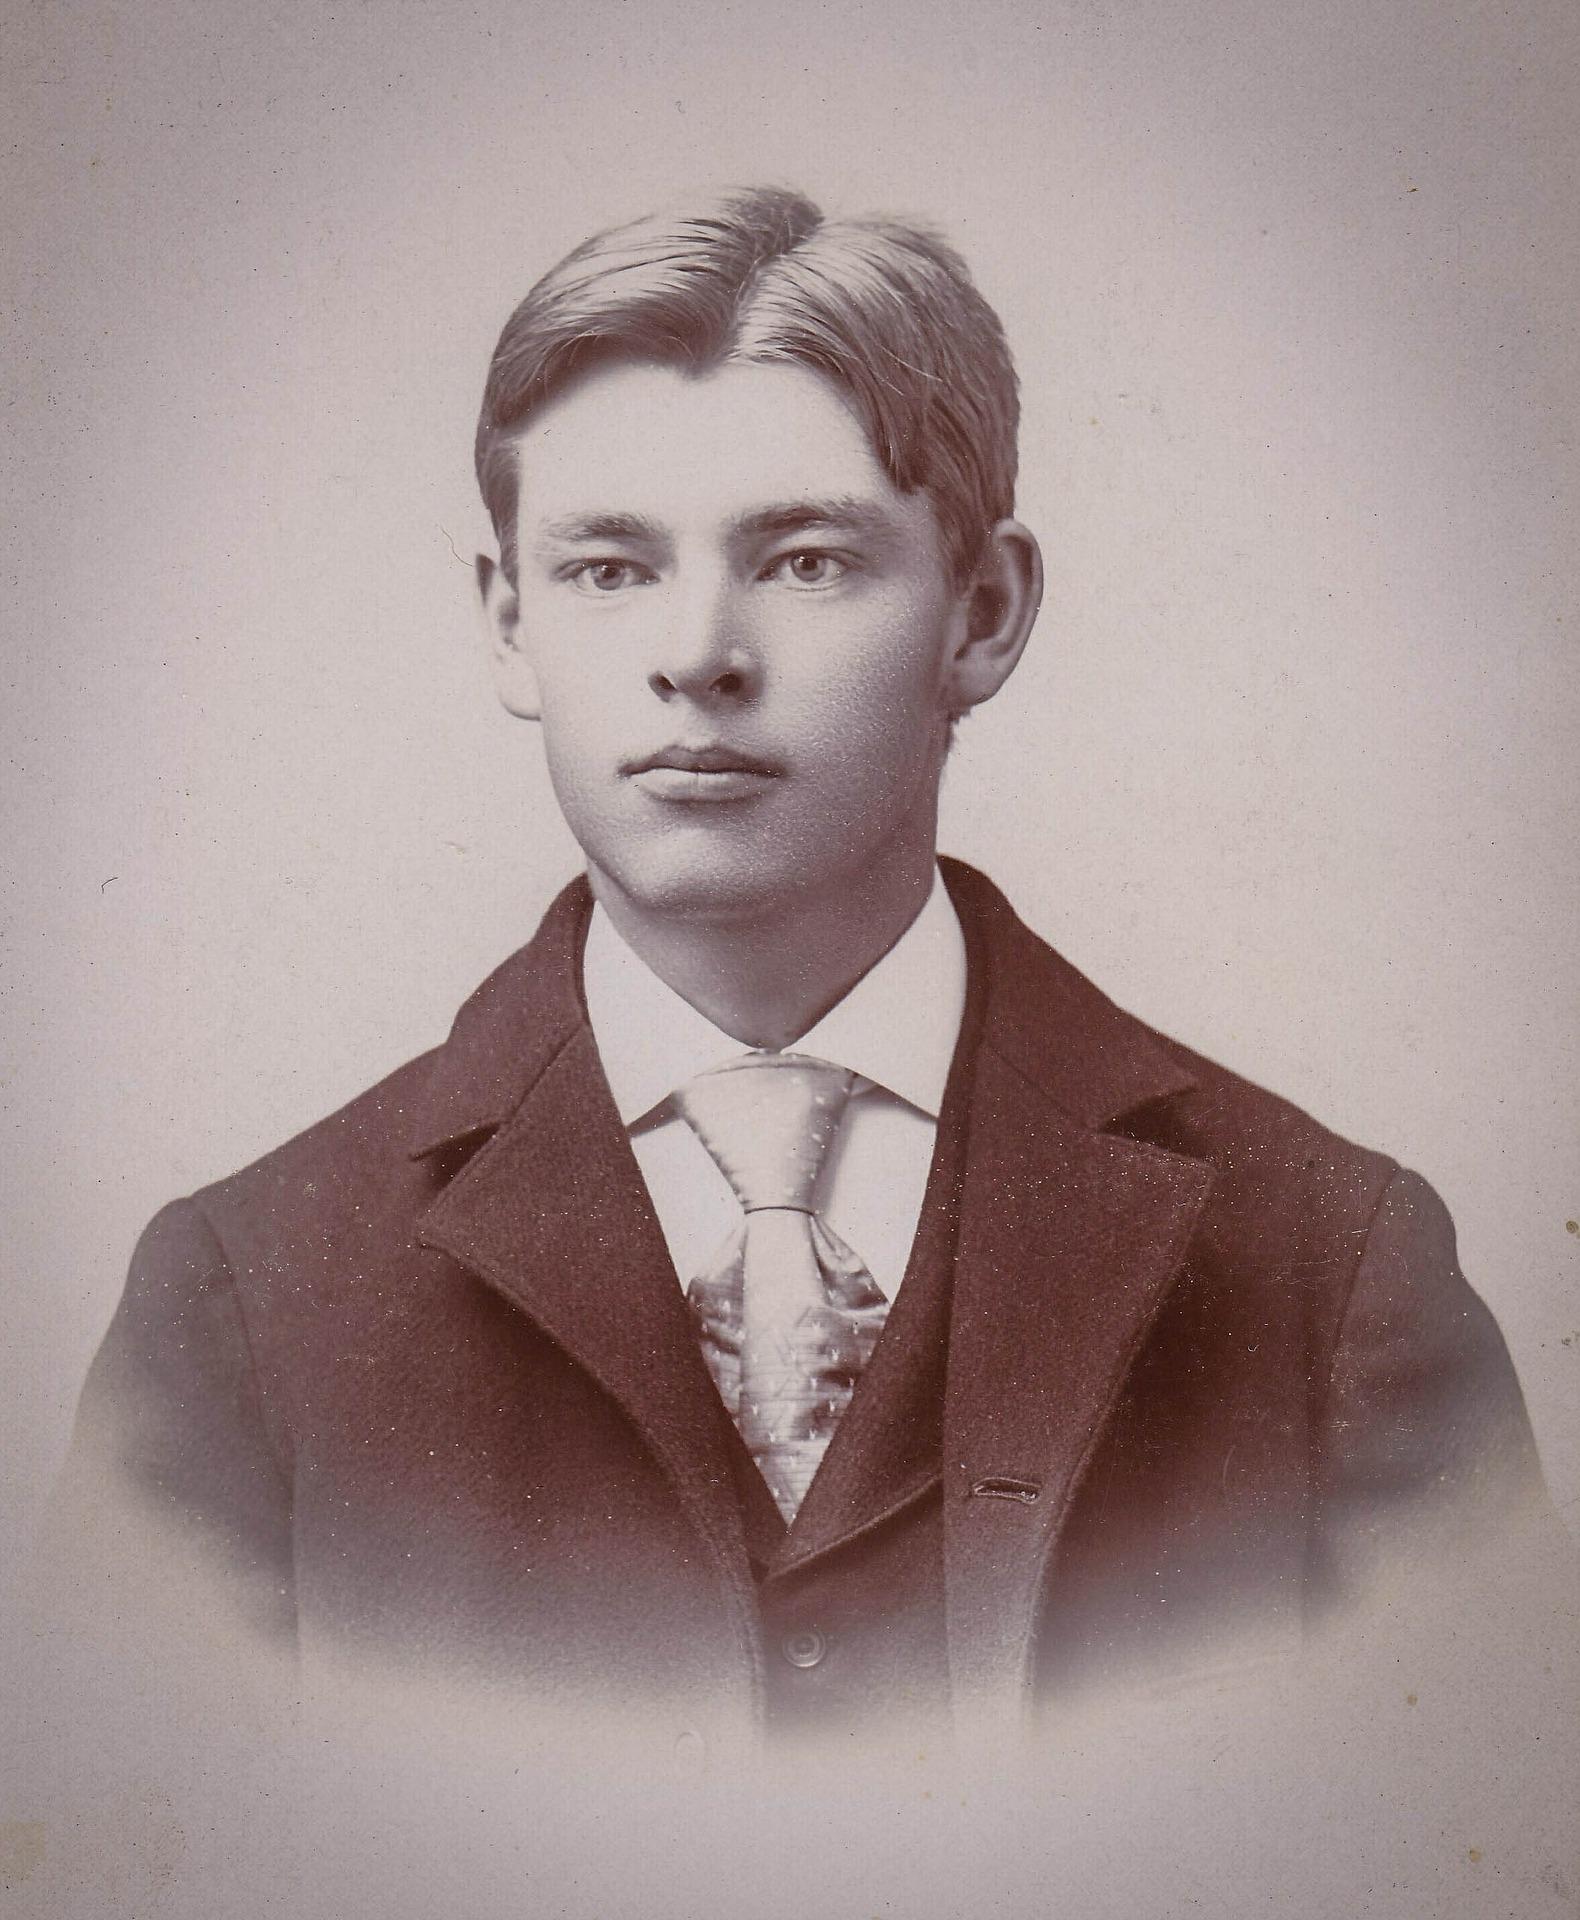 portret-stara-fotka